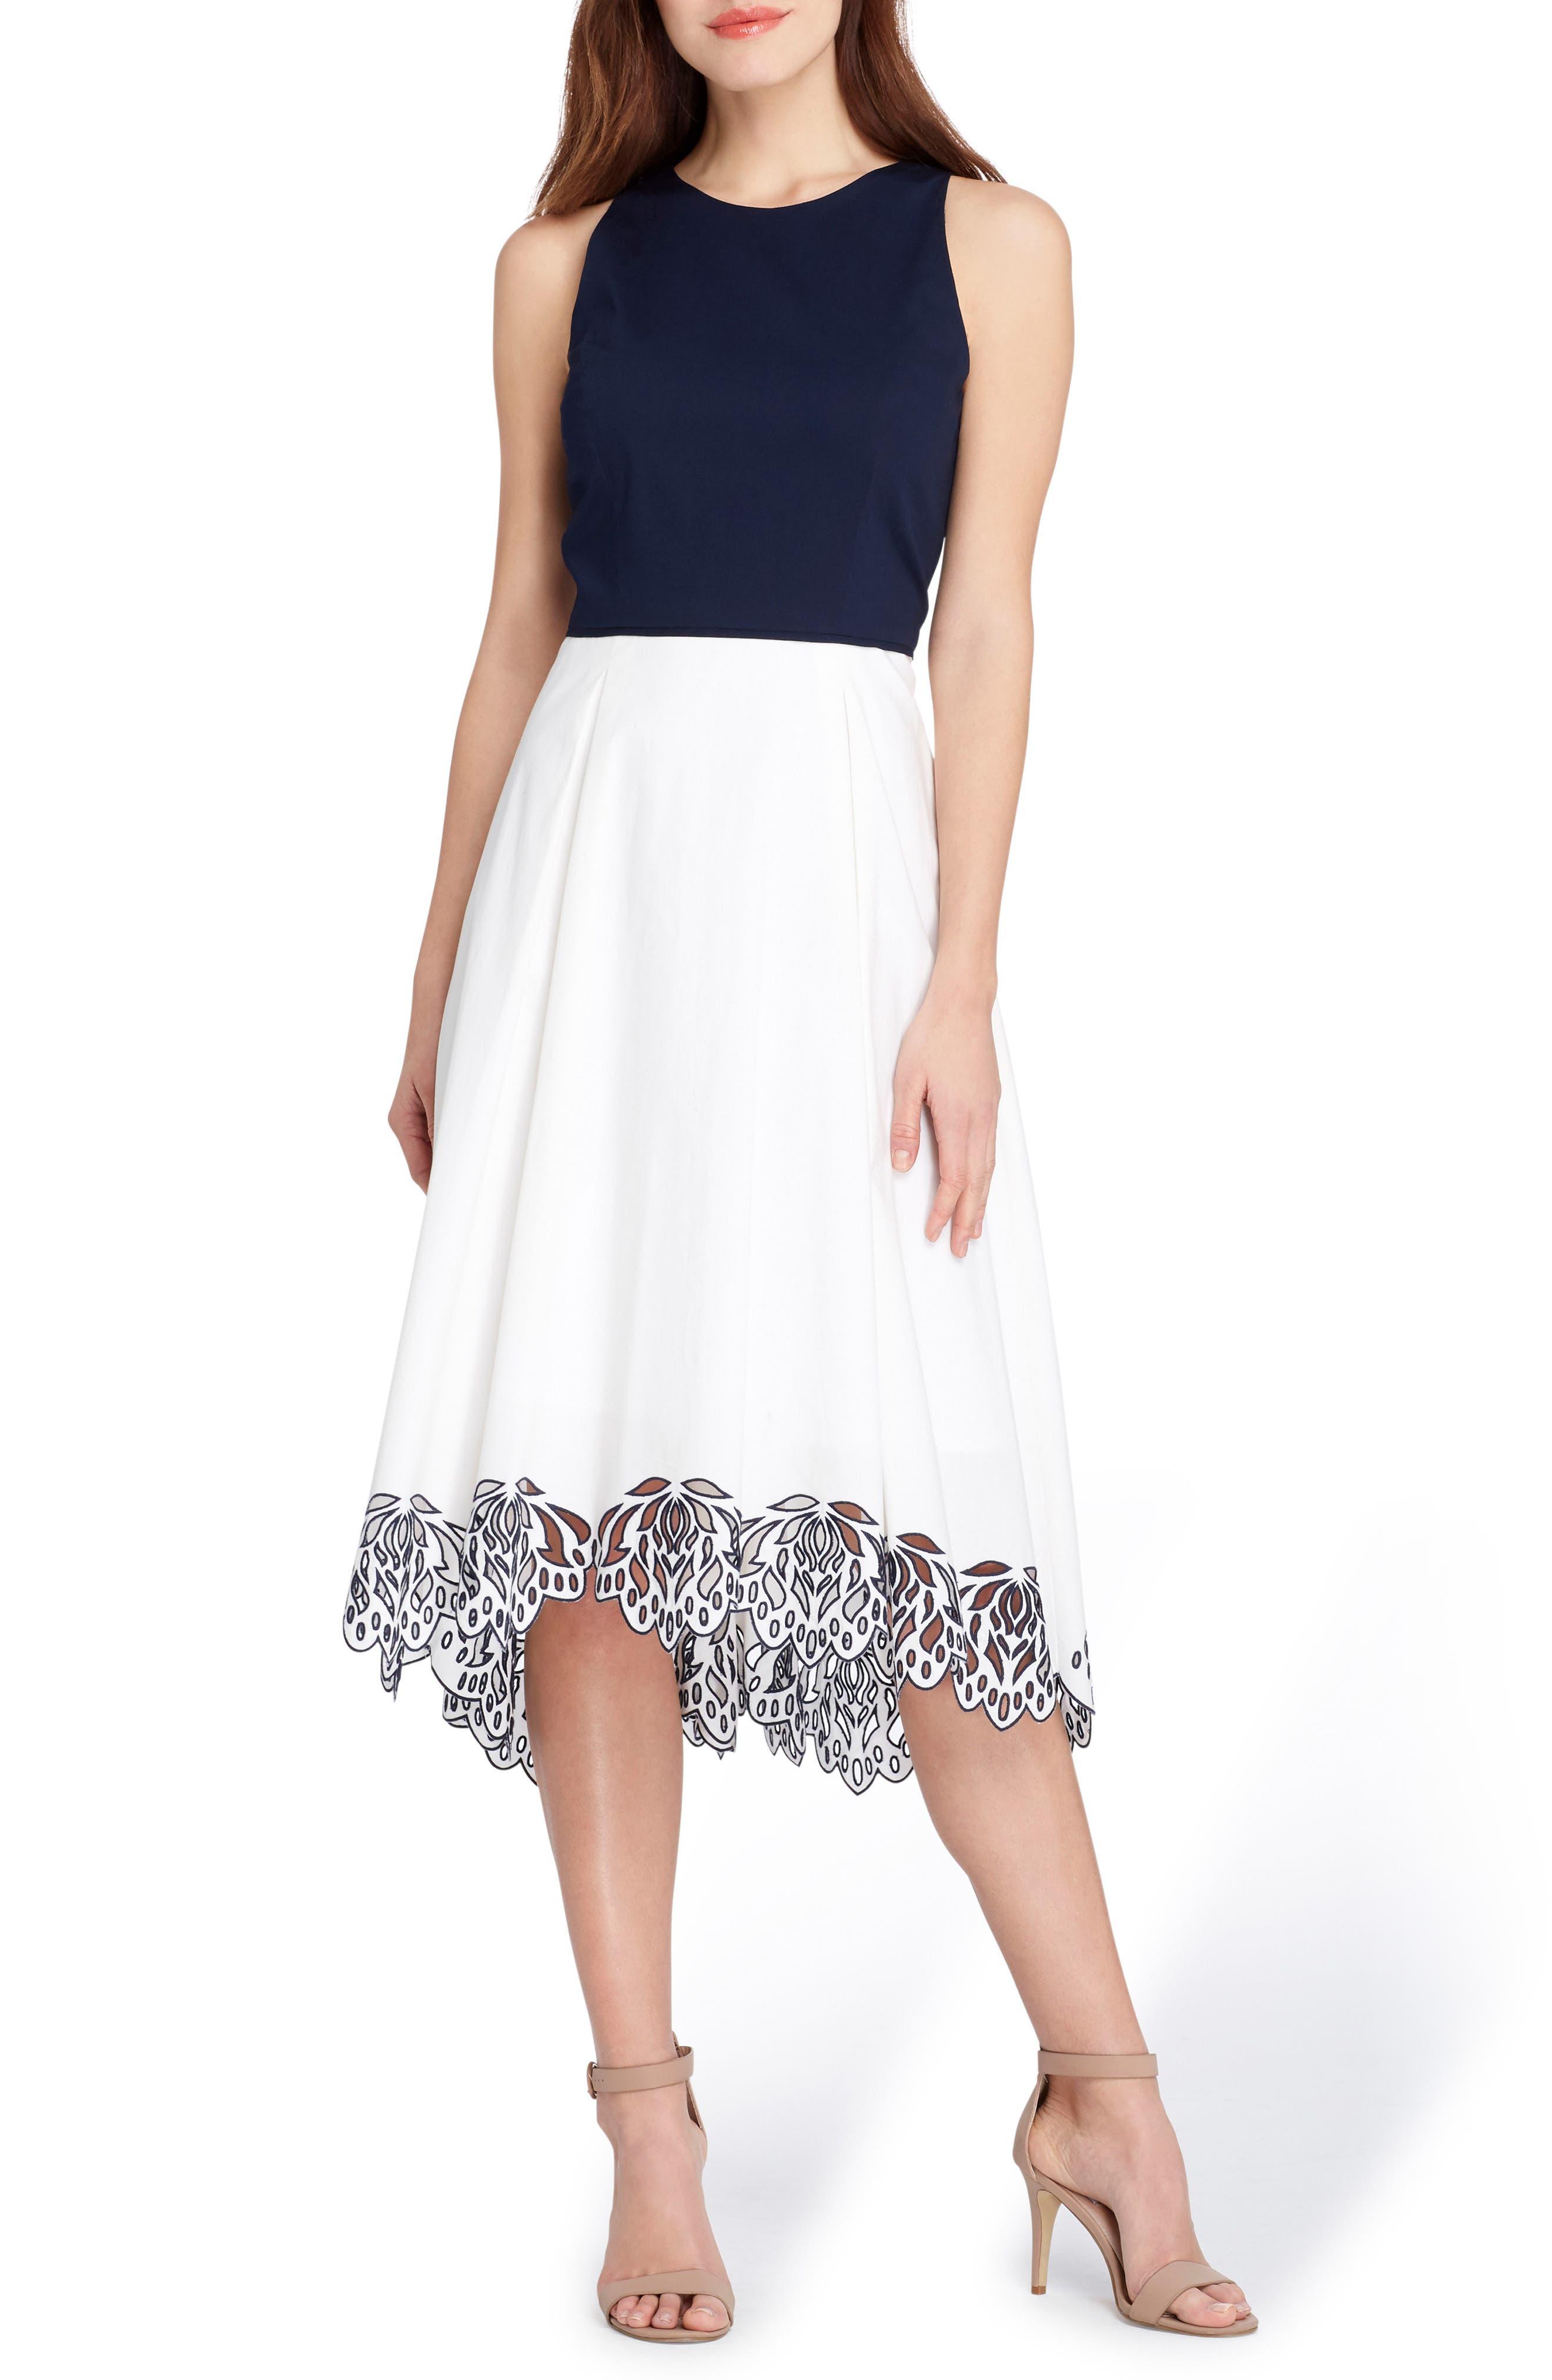 Sleeveless Floral Hem Midi Dress,                             Main thumbnail 1, color,                             White/ Navy